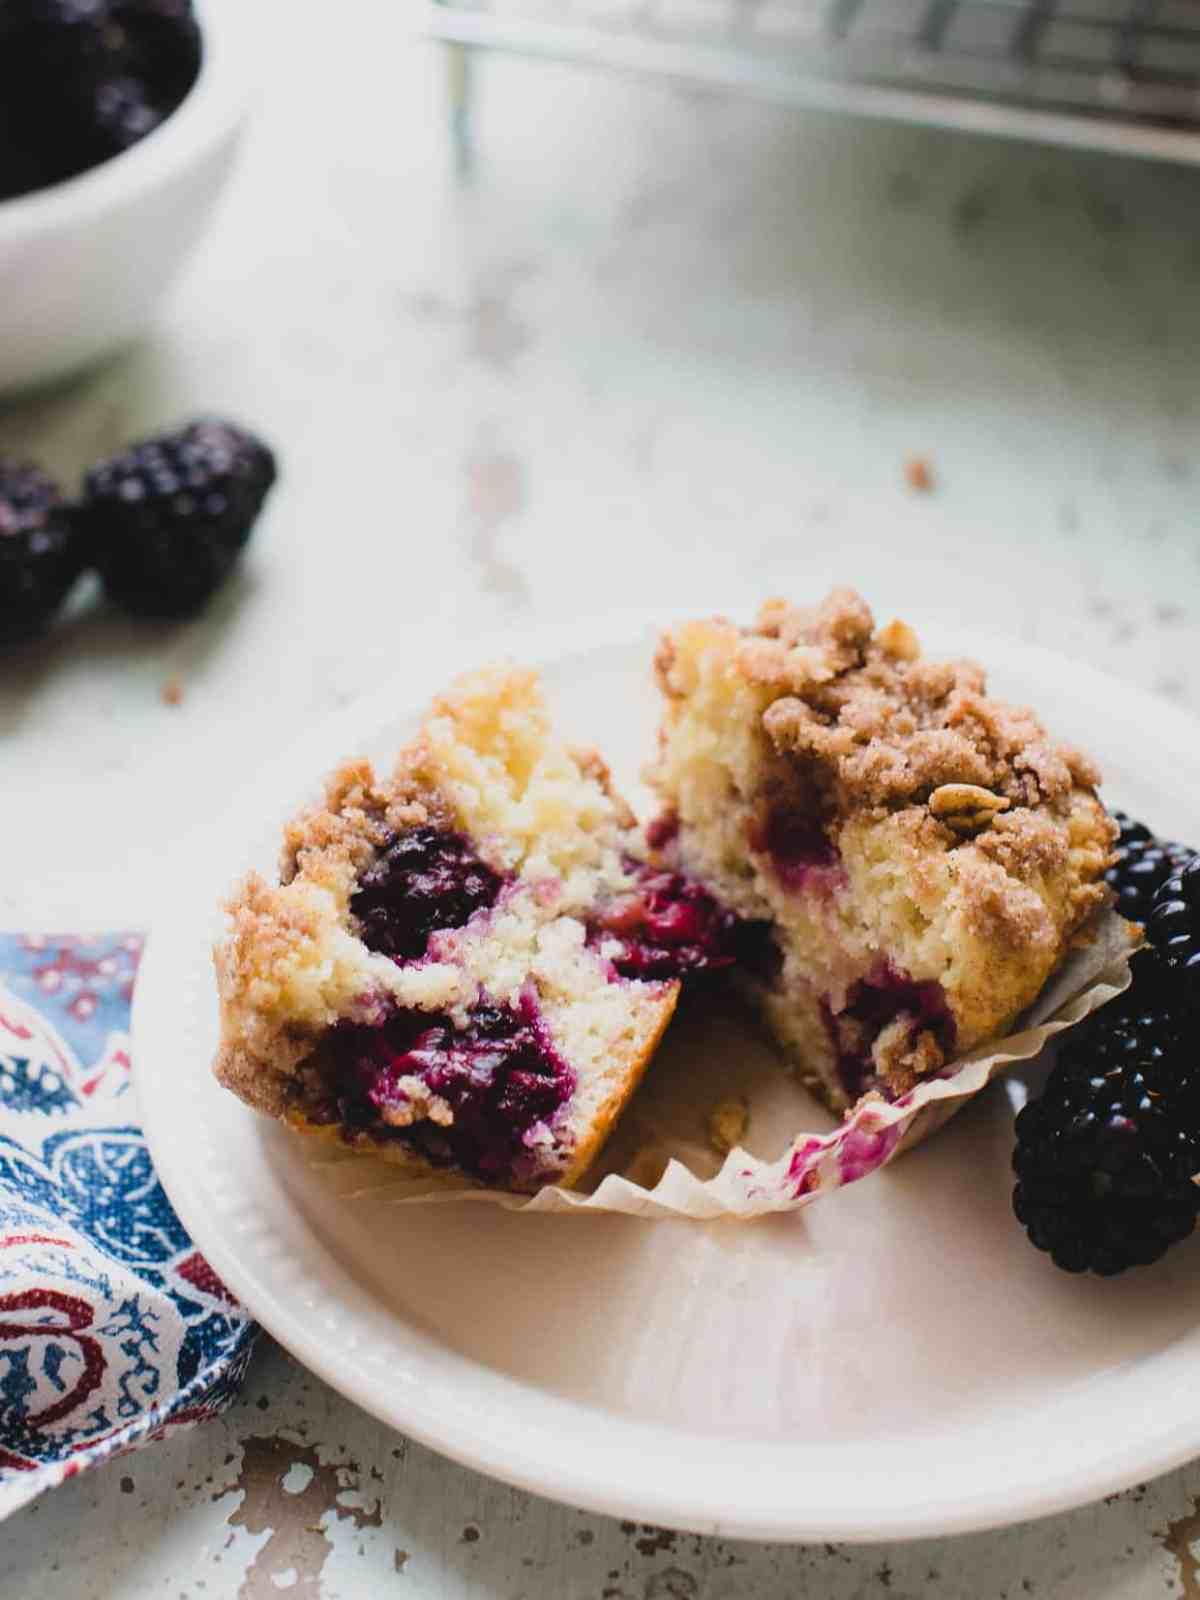 Freshly baked blackberry yogurt muffin cut in half on a white plate.